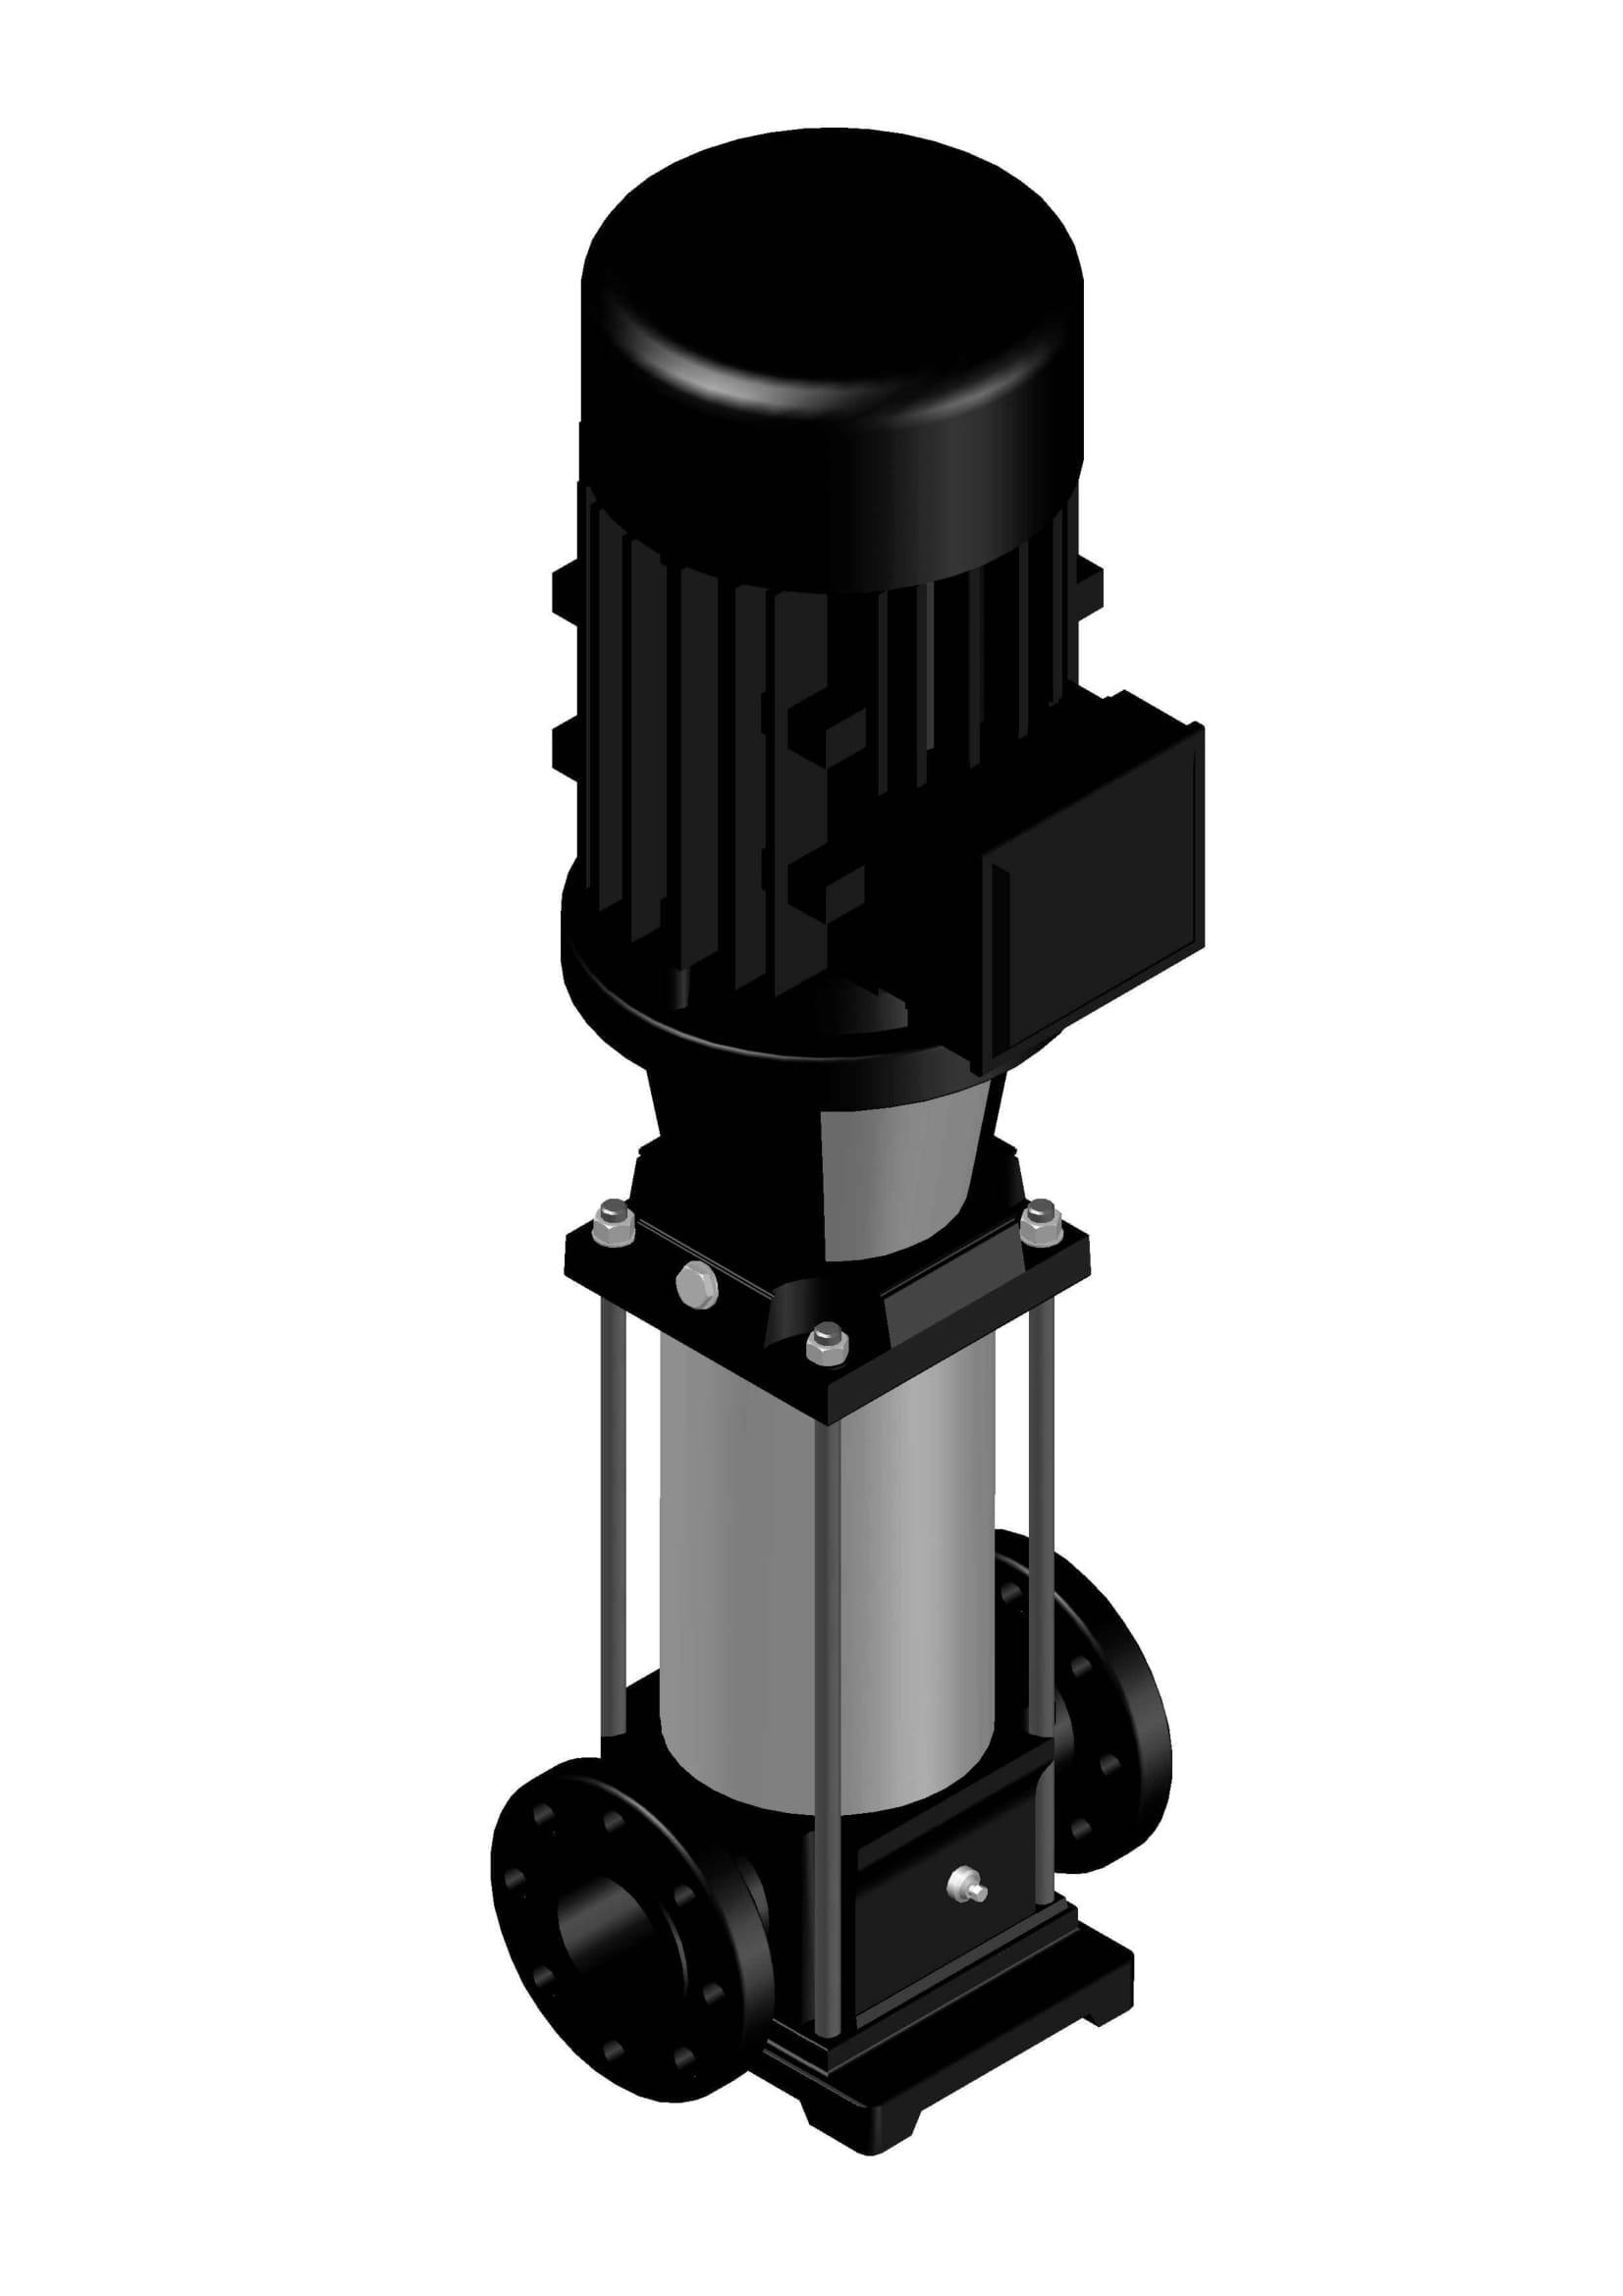 BV 64-03